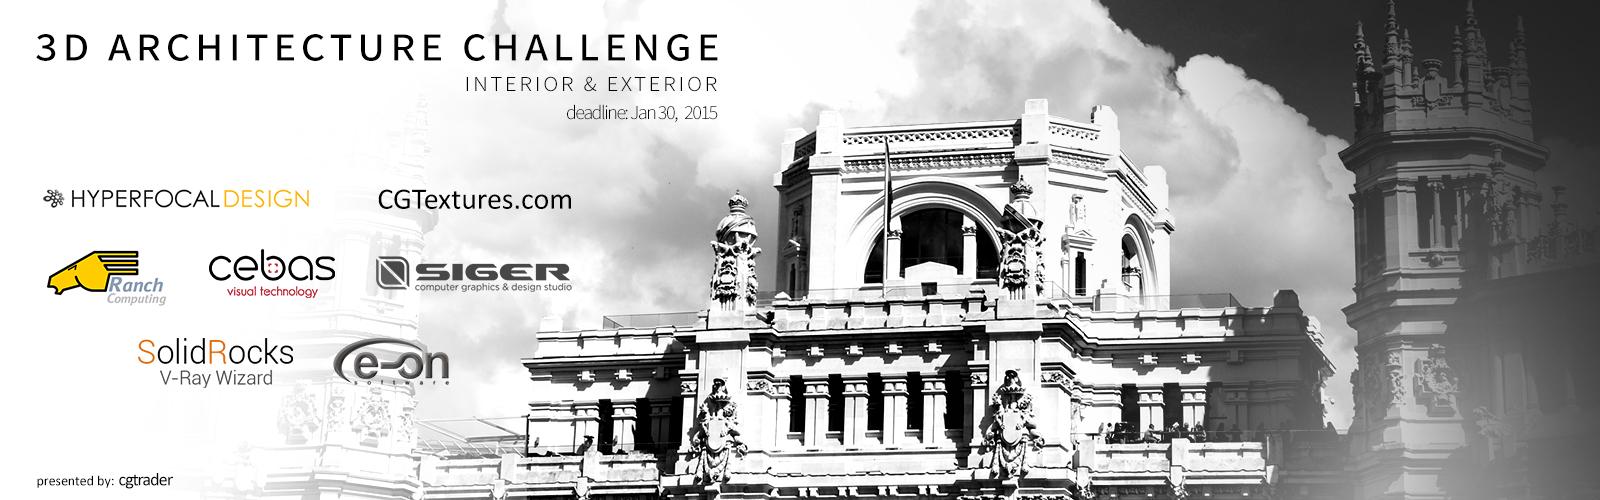 3D CG Architecture Challenge